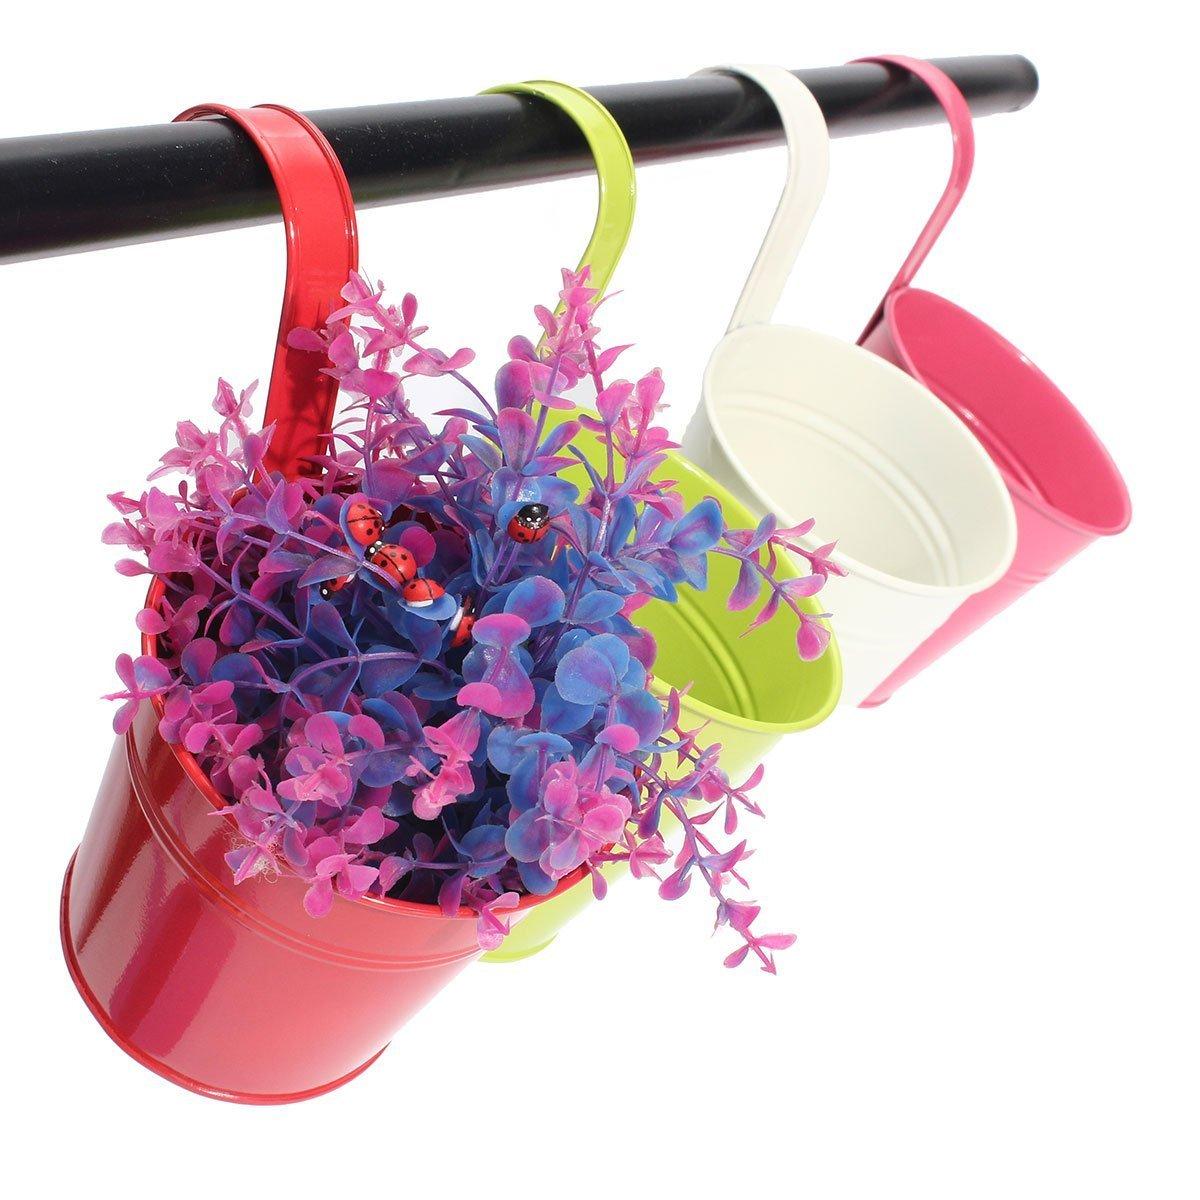 KINGLAKE Flower Pots,10 Pcs Metal Iron Hanging Flower Plant Pots Balcony Garden Plant Planter Baskets Fence Bucket Pots Flower Holders with Detachable Hook by KINGLAKE